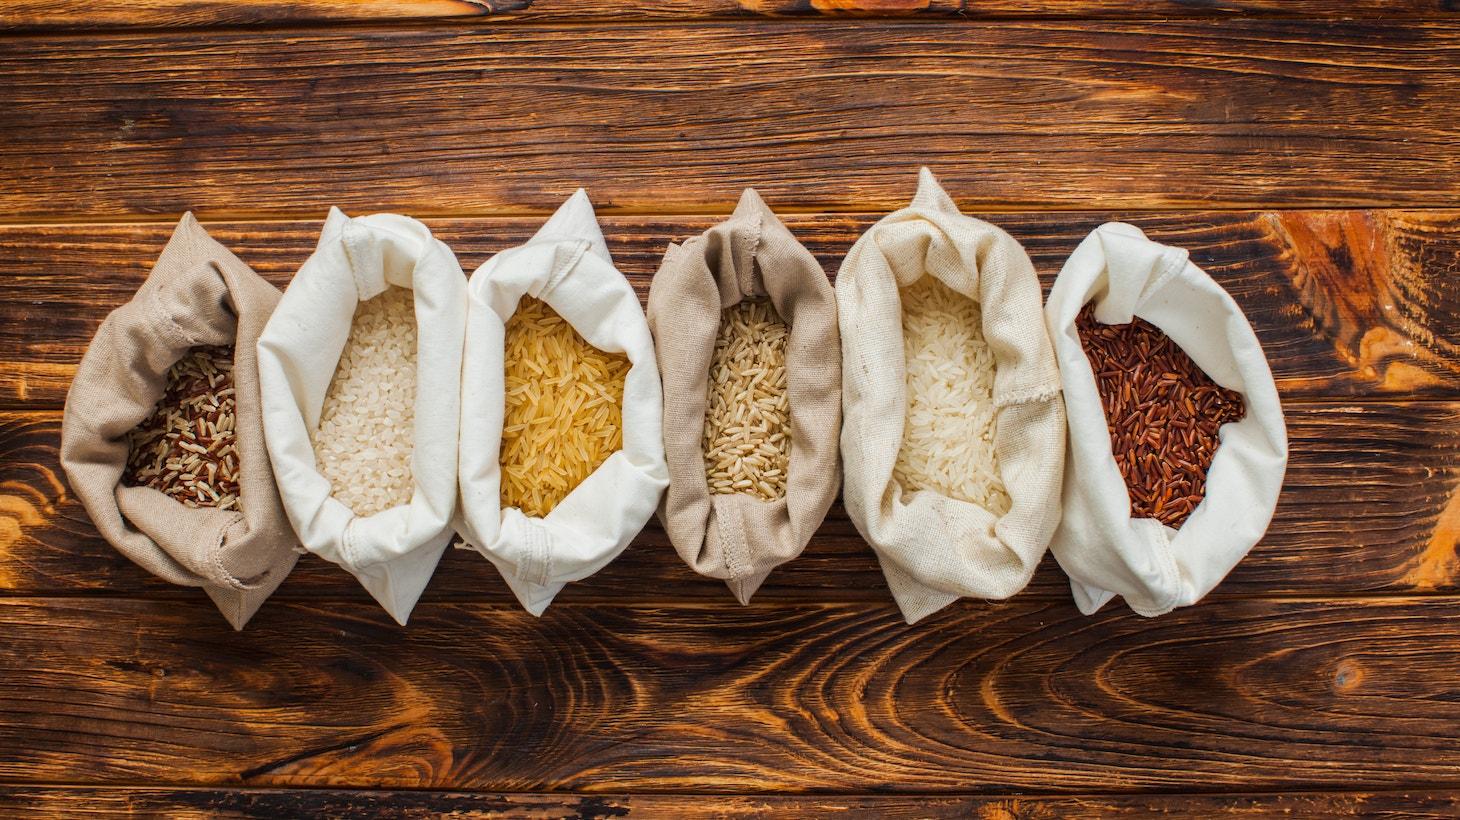 Reis kochen: So geht's richtig